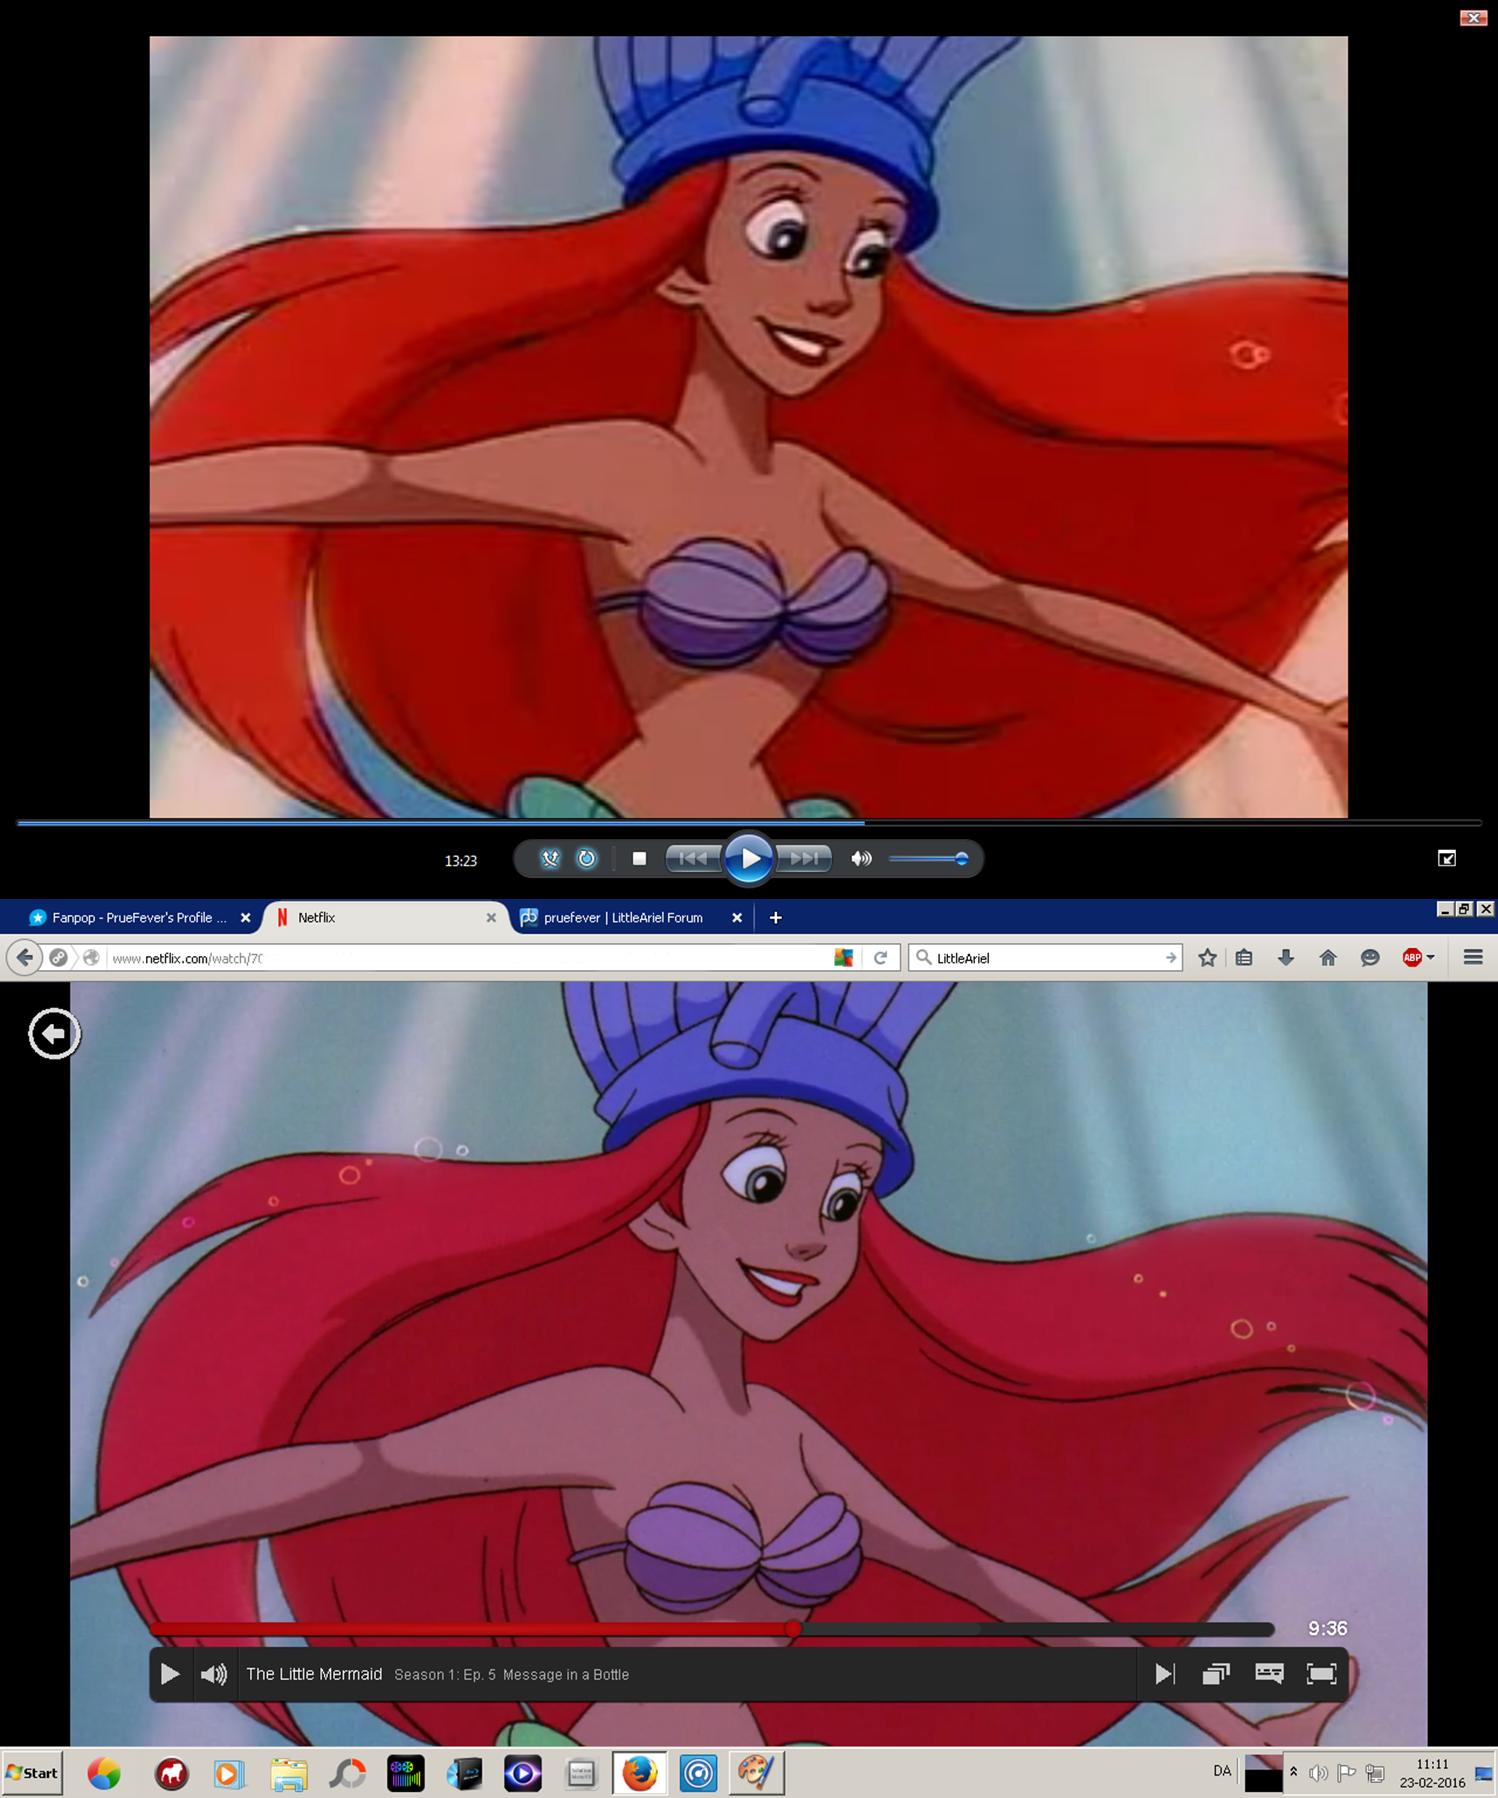 La Petite Sirène [Disney Television - 1992-1994] Walt-Disney-Images-The-Little-Mermaid-Tv-series-Tv-rip-vs-Netflix-HD-walt-disney-characters-39329671-1498-1798